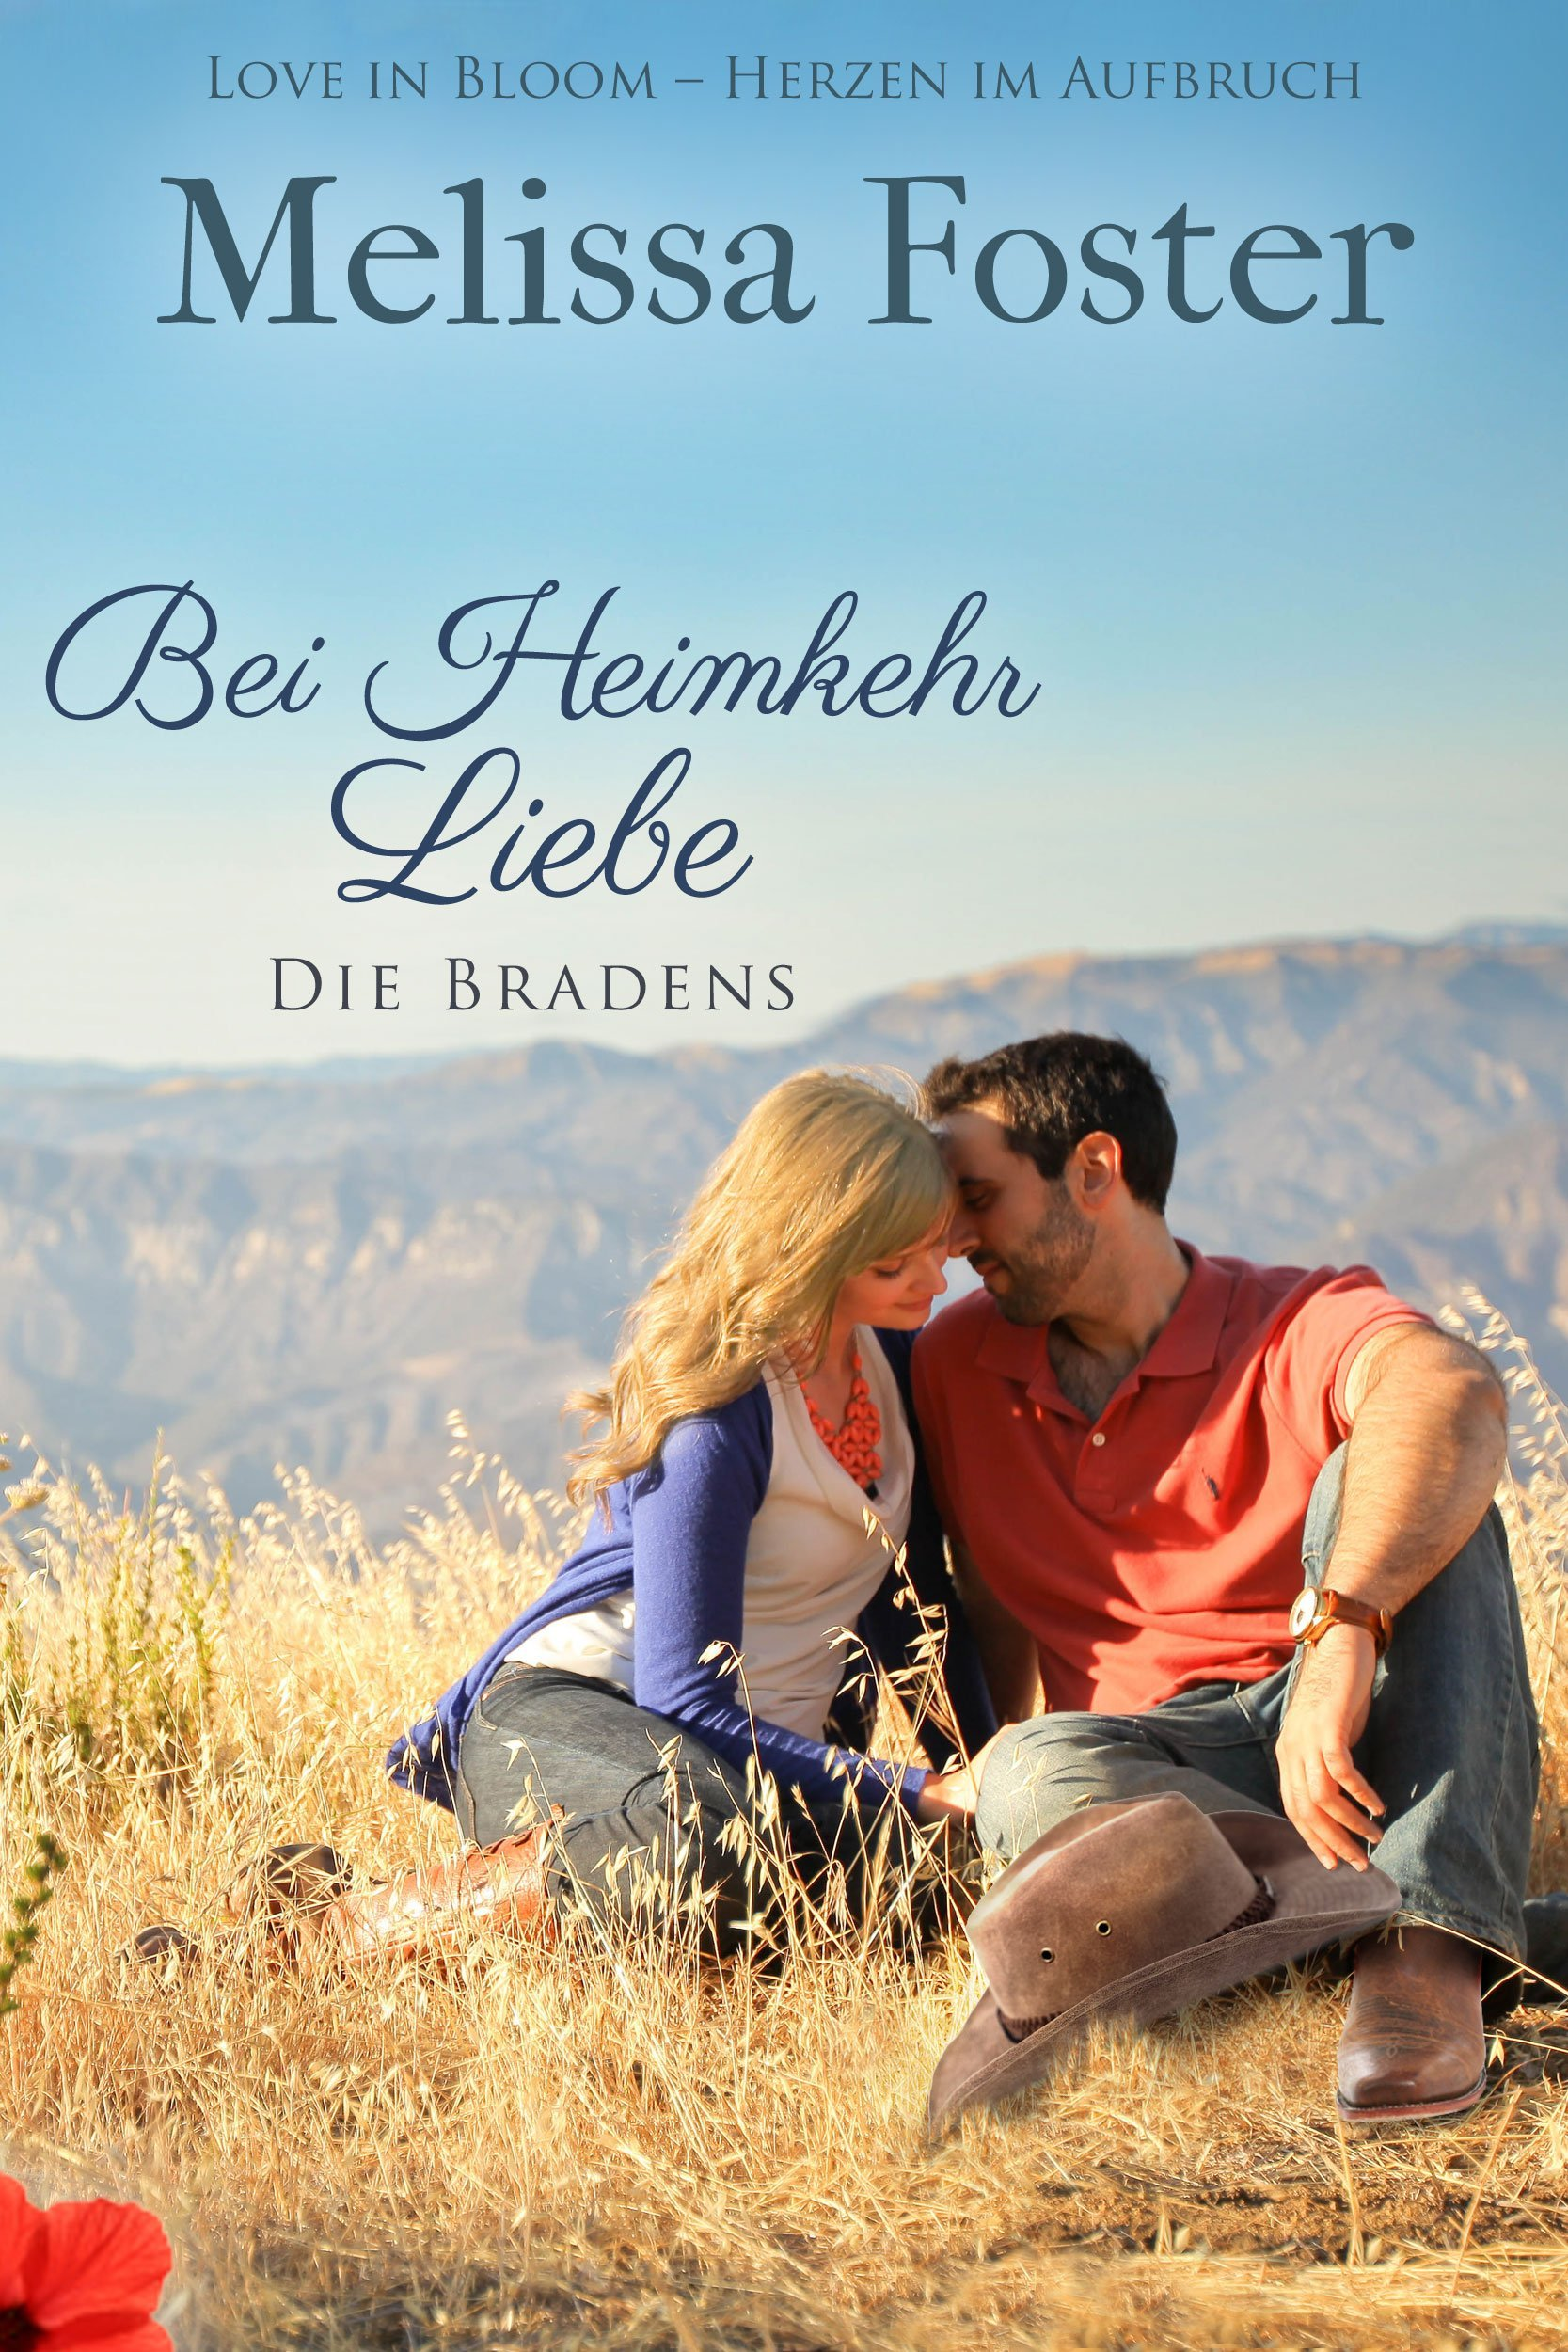 Bei Heimkehr Liebe by Melissa Foster a Love In Bloom Contemporary Romance